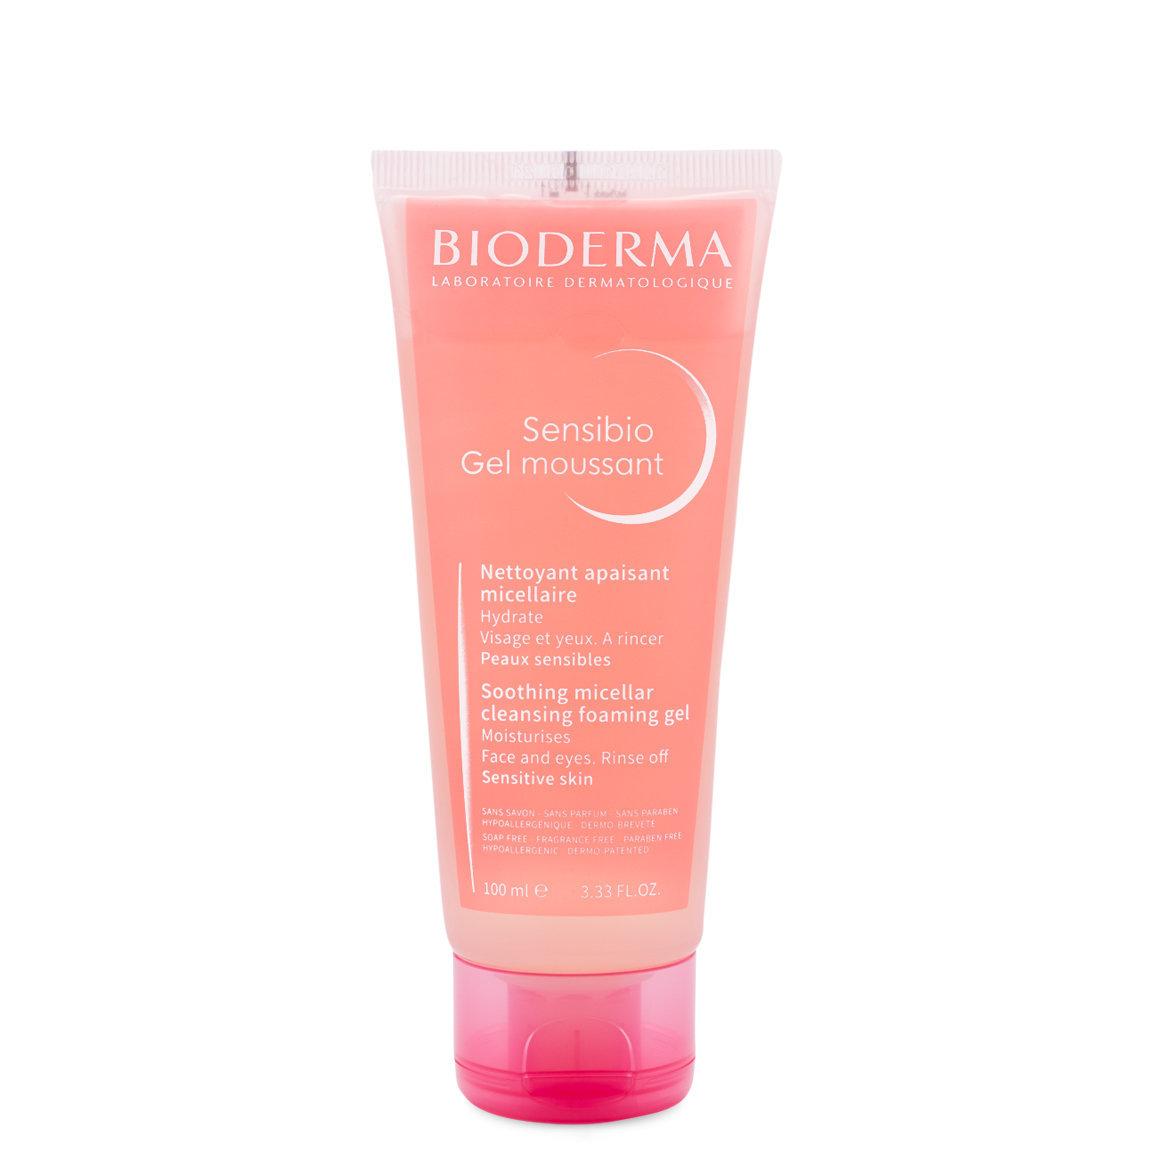 Bioderma Sensibio Foaming Gel 100 ml alternative view 1 - product swatch.